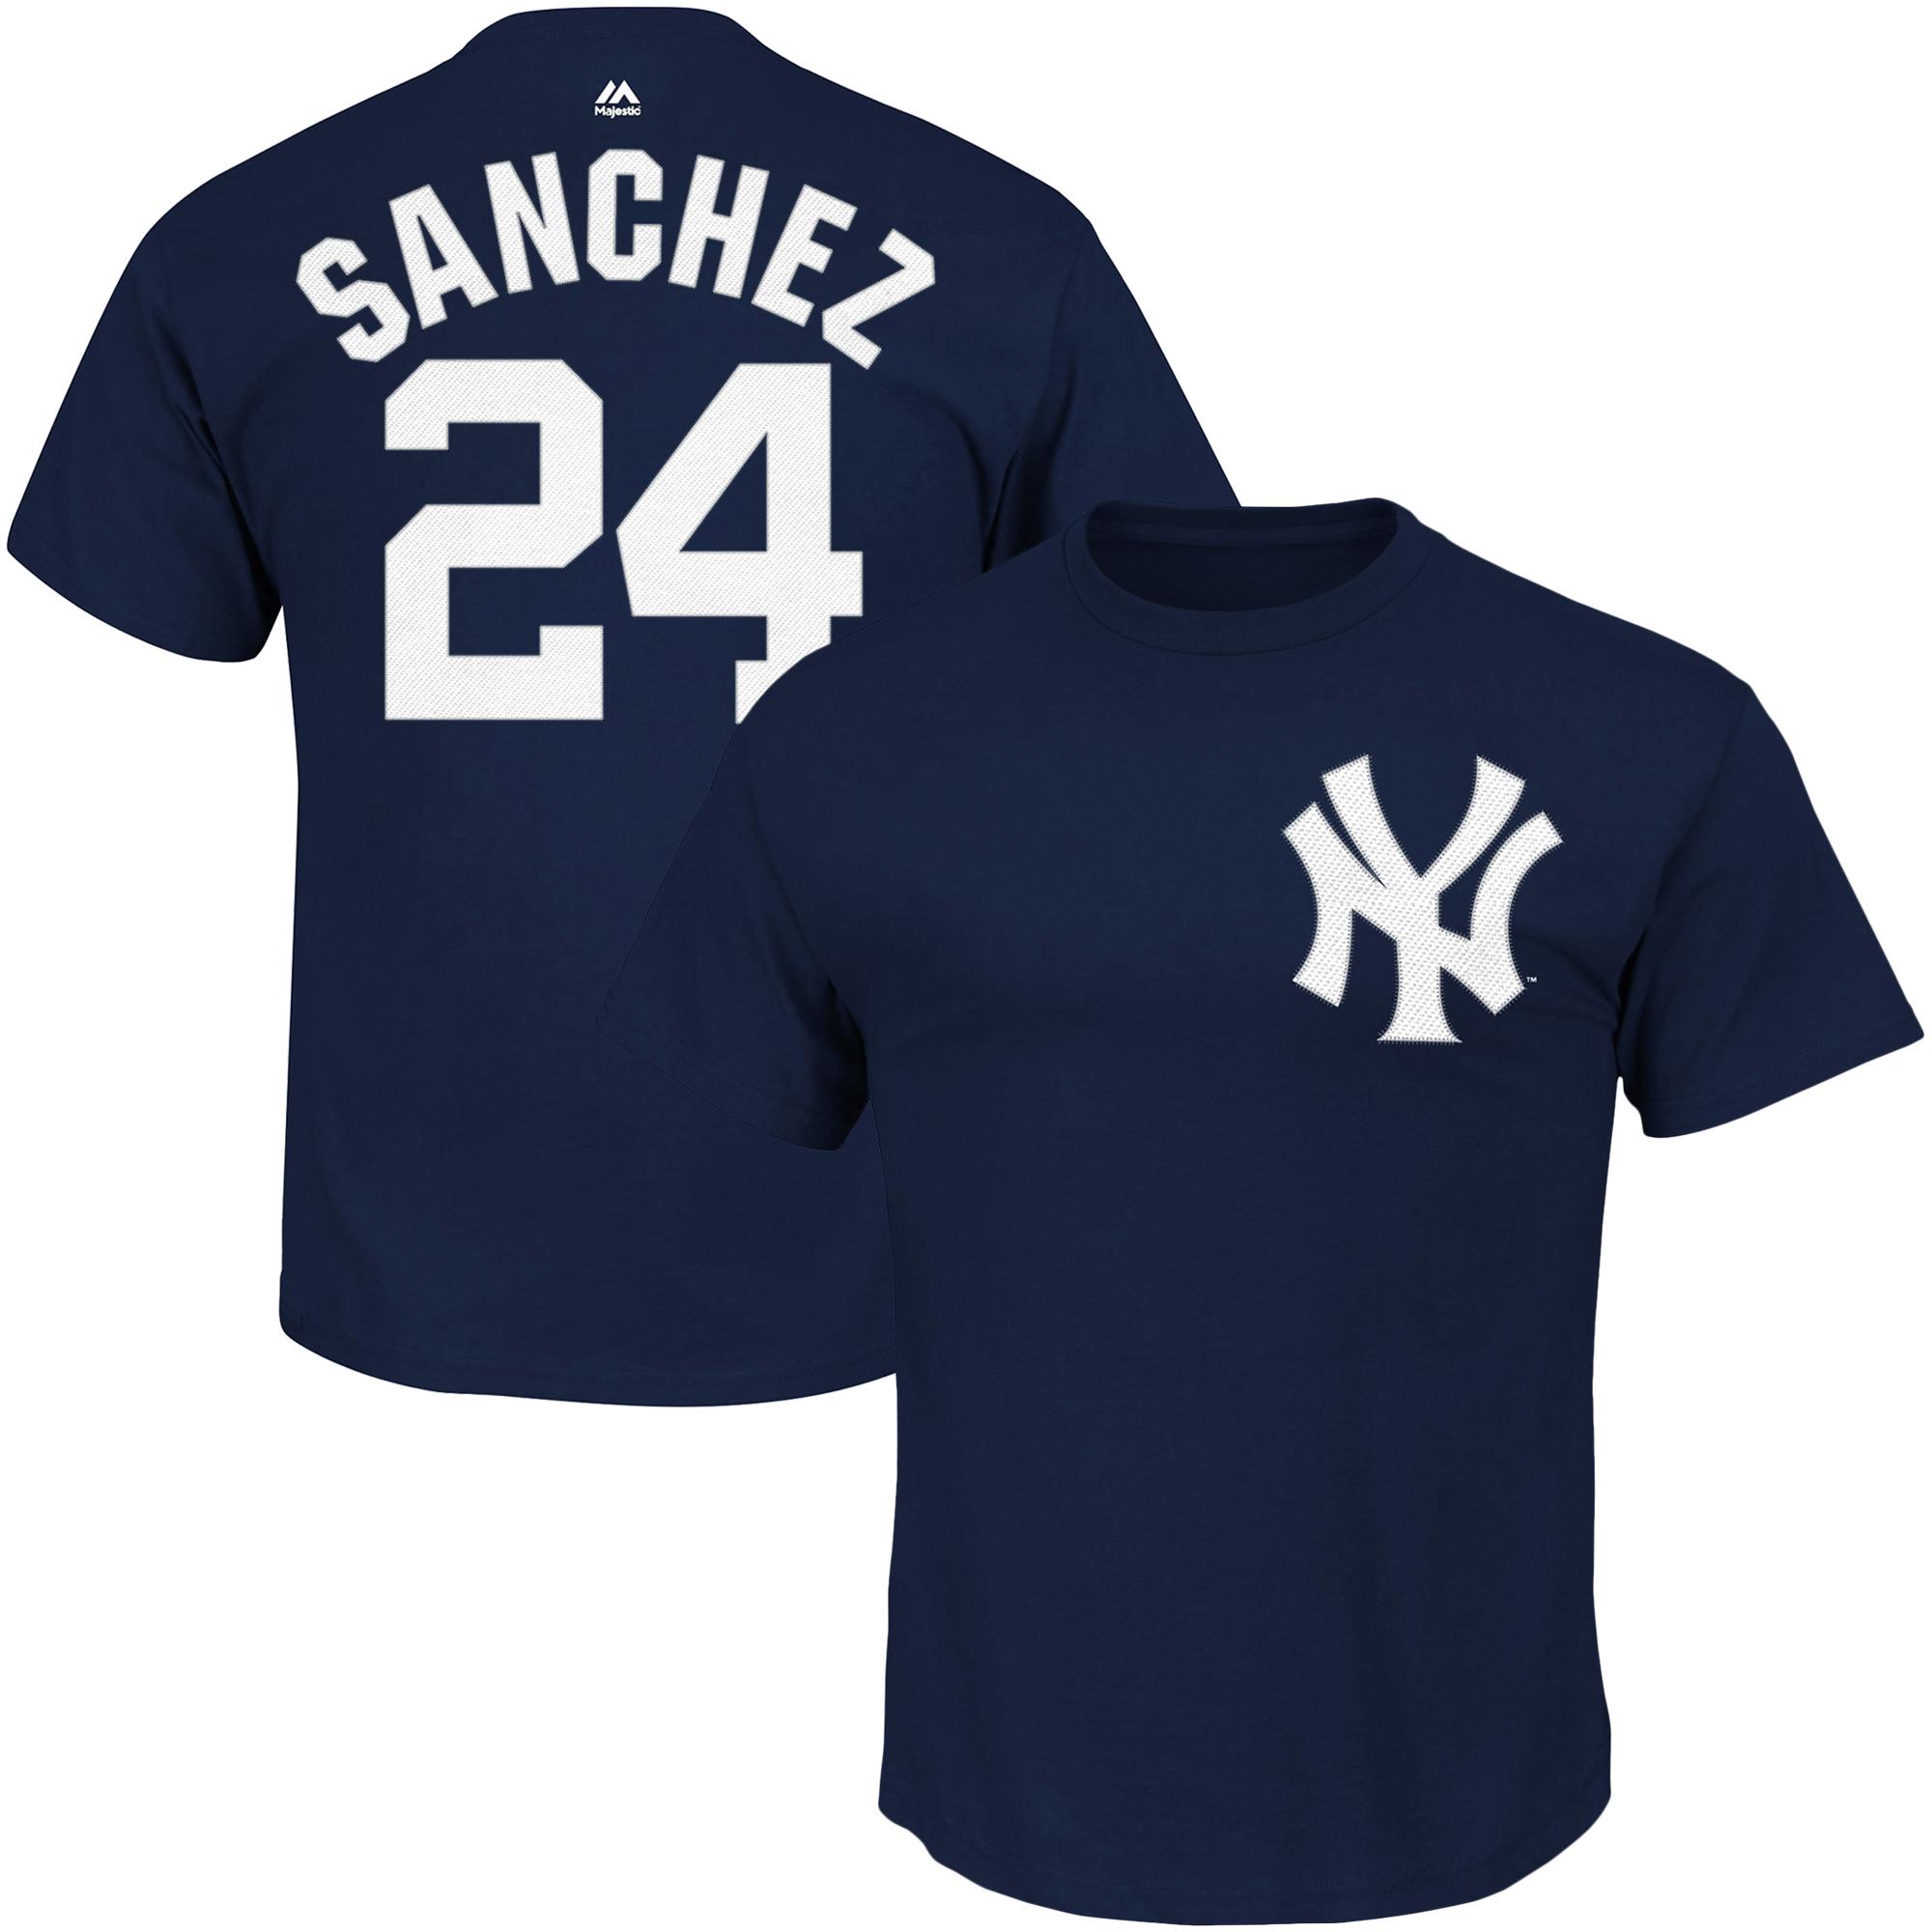 Gary Sanchez New York Yankees Majestic Big & Tall Player T-Shirt - Navy